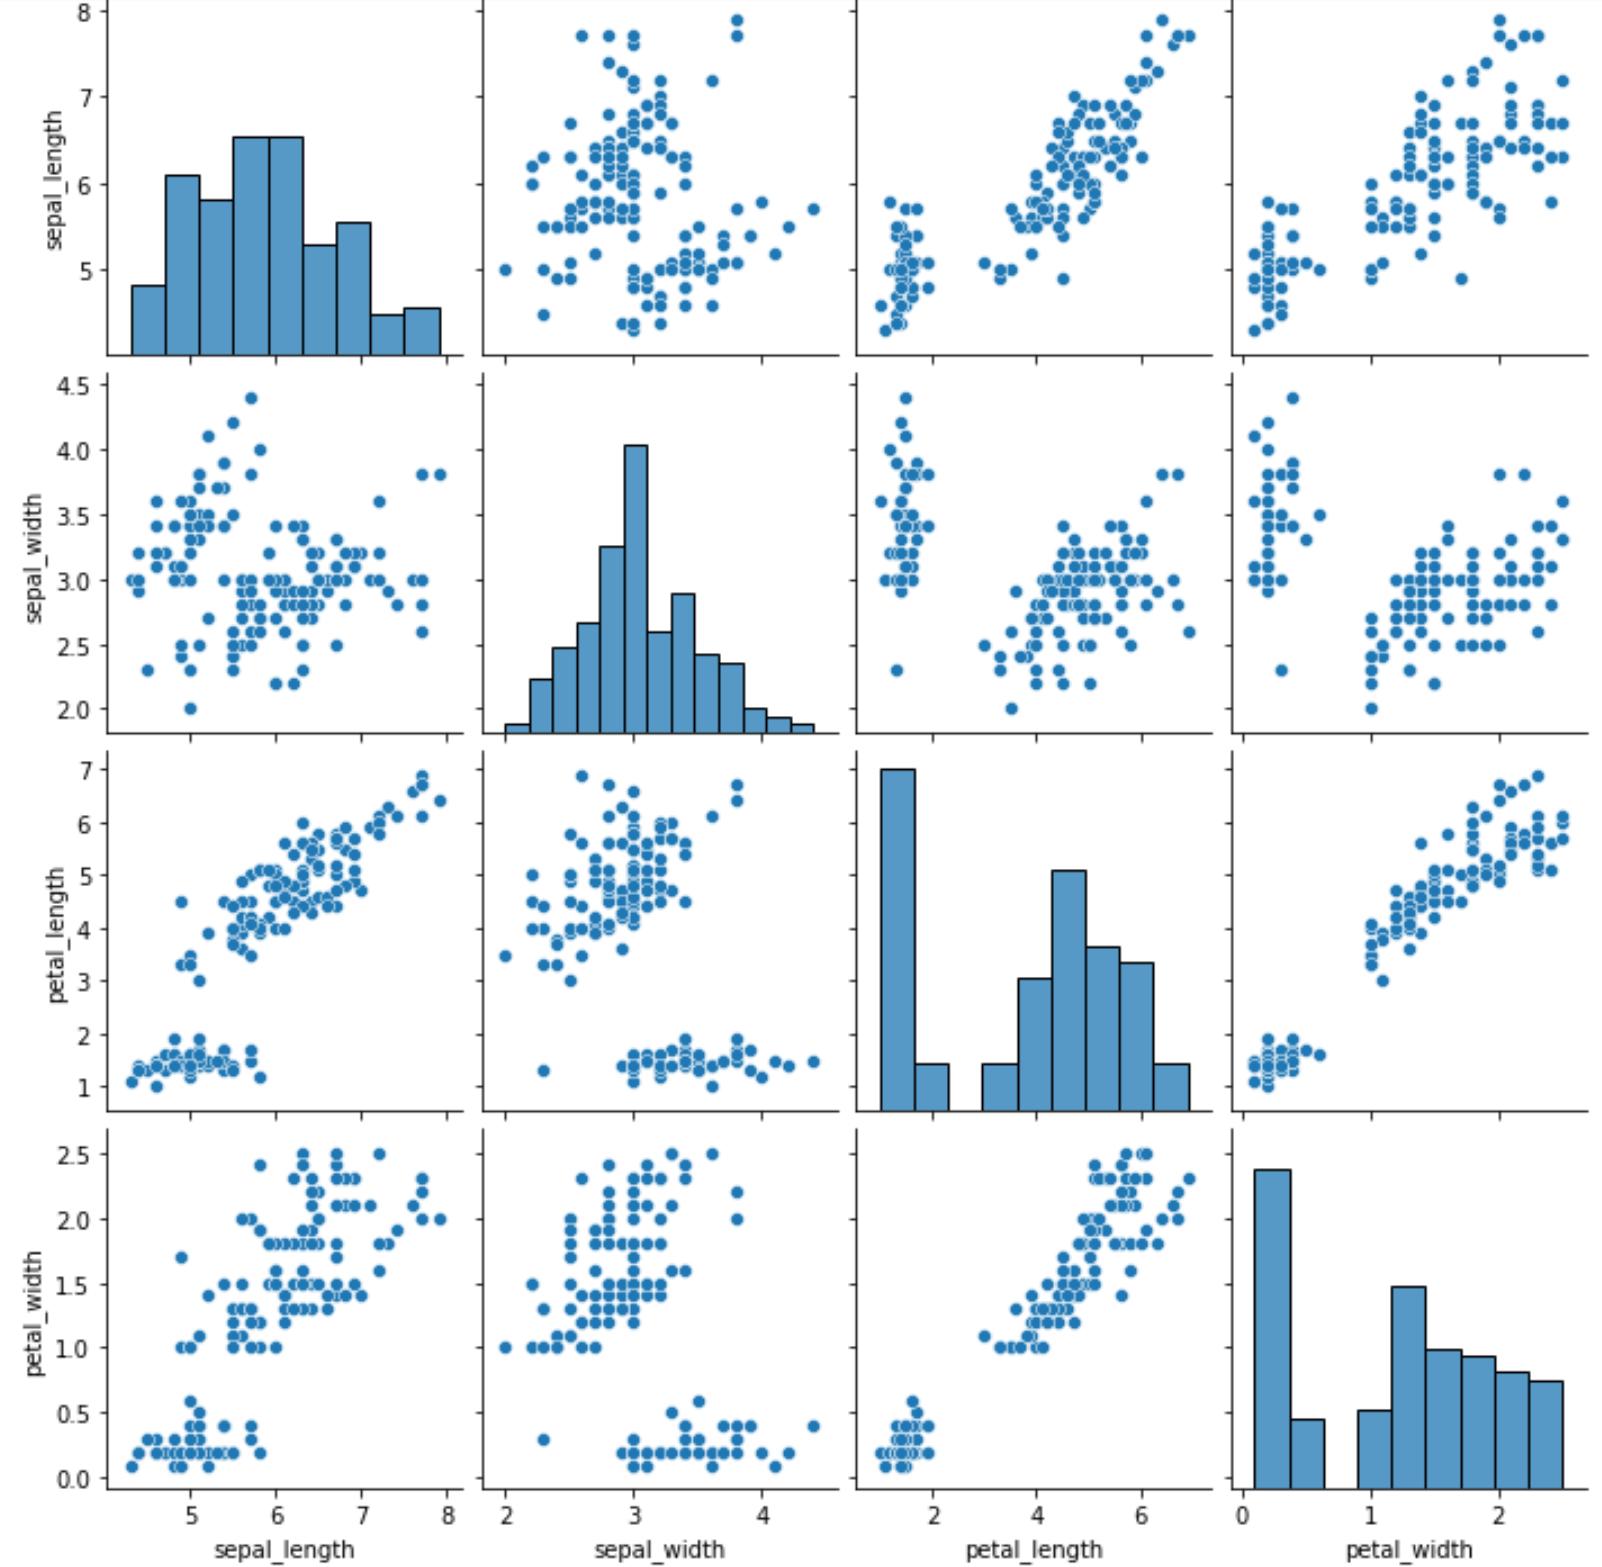 Pairs plot in Python